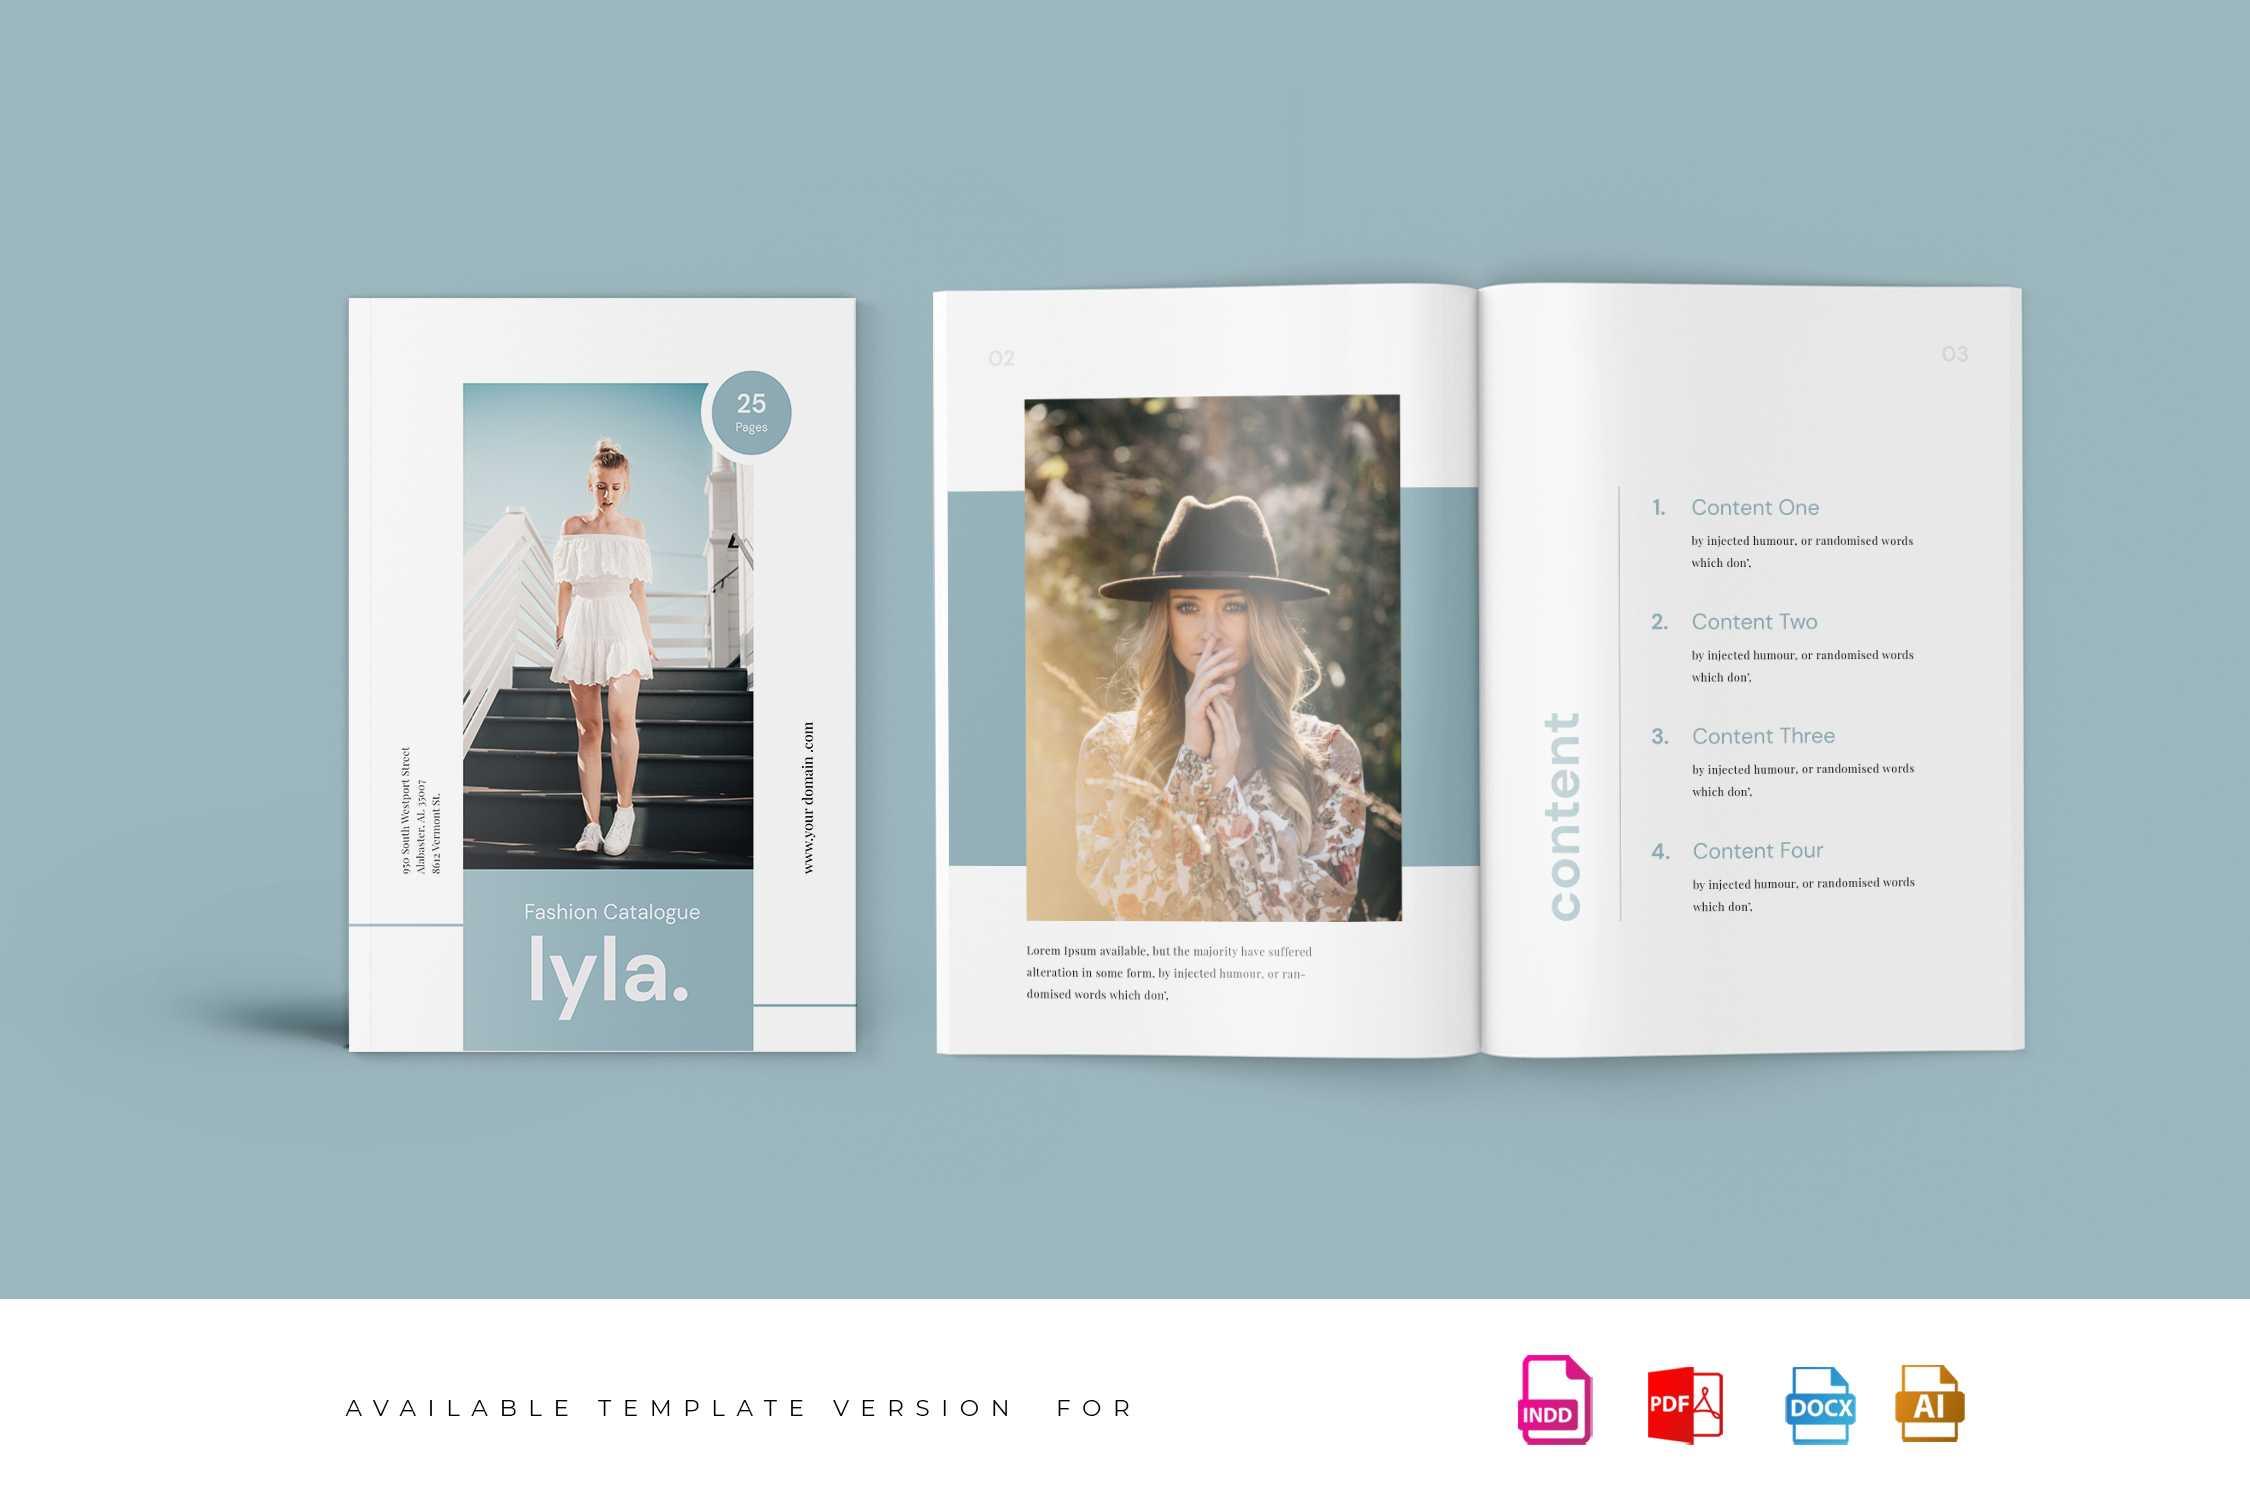 Lyla - Fashion Magazine Template Pertaining To Magazine Template For Microsoft Word